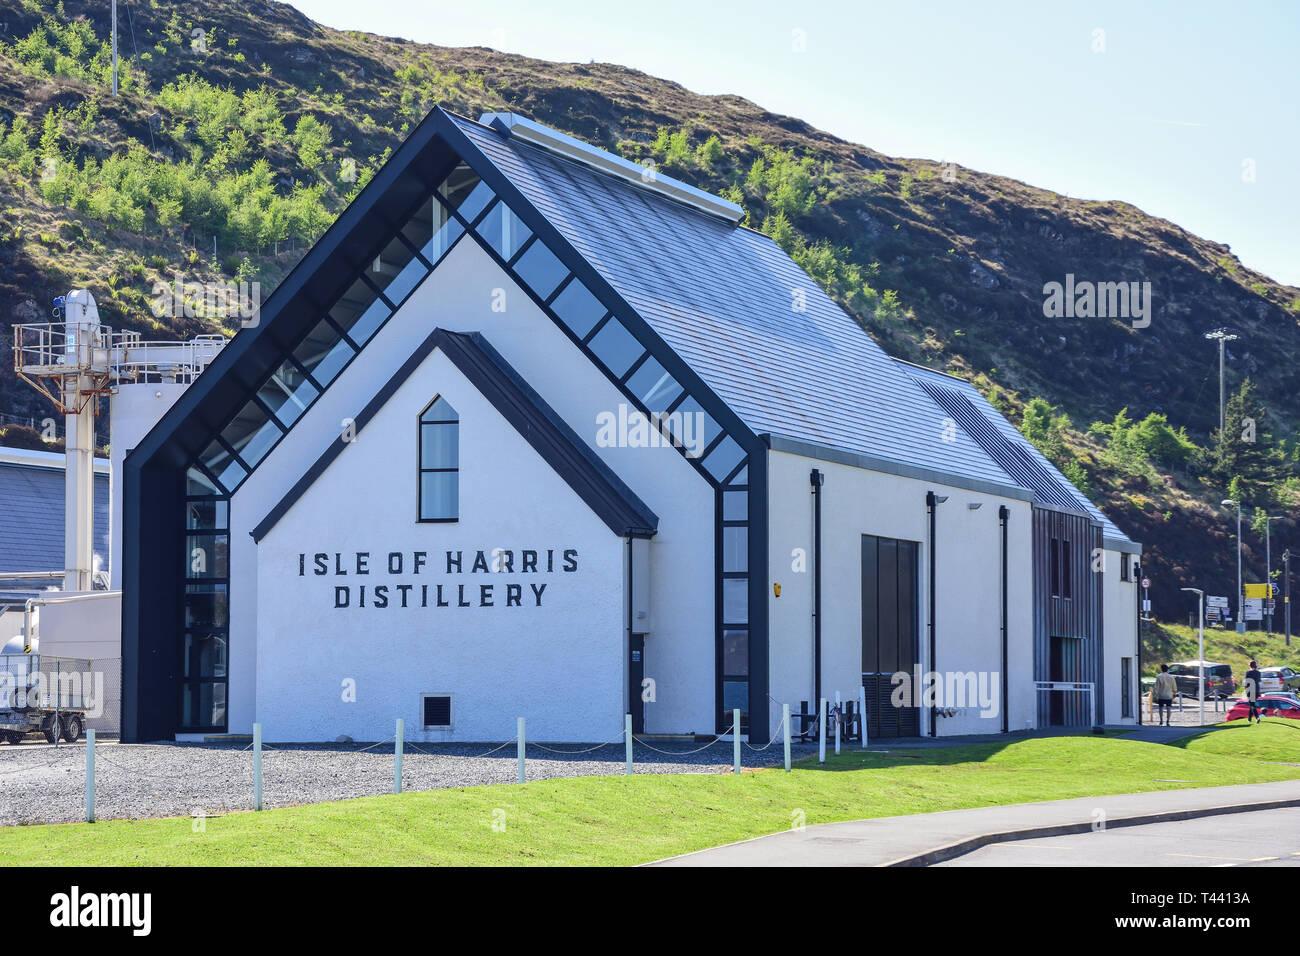 Besucherzentrum, Isle of Harris Distillery, Hafen Straße, Tarbert (Tairbeart), Isle of Harris, Äußere Hebriden, Na h-eileanan Siar, Schottland, Vereinigtes K Stockbild